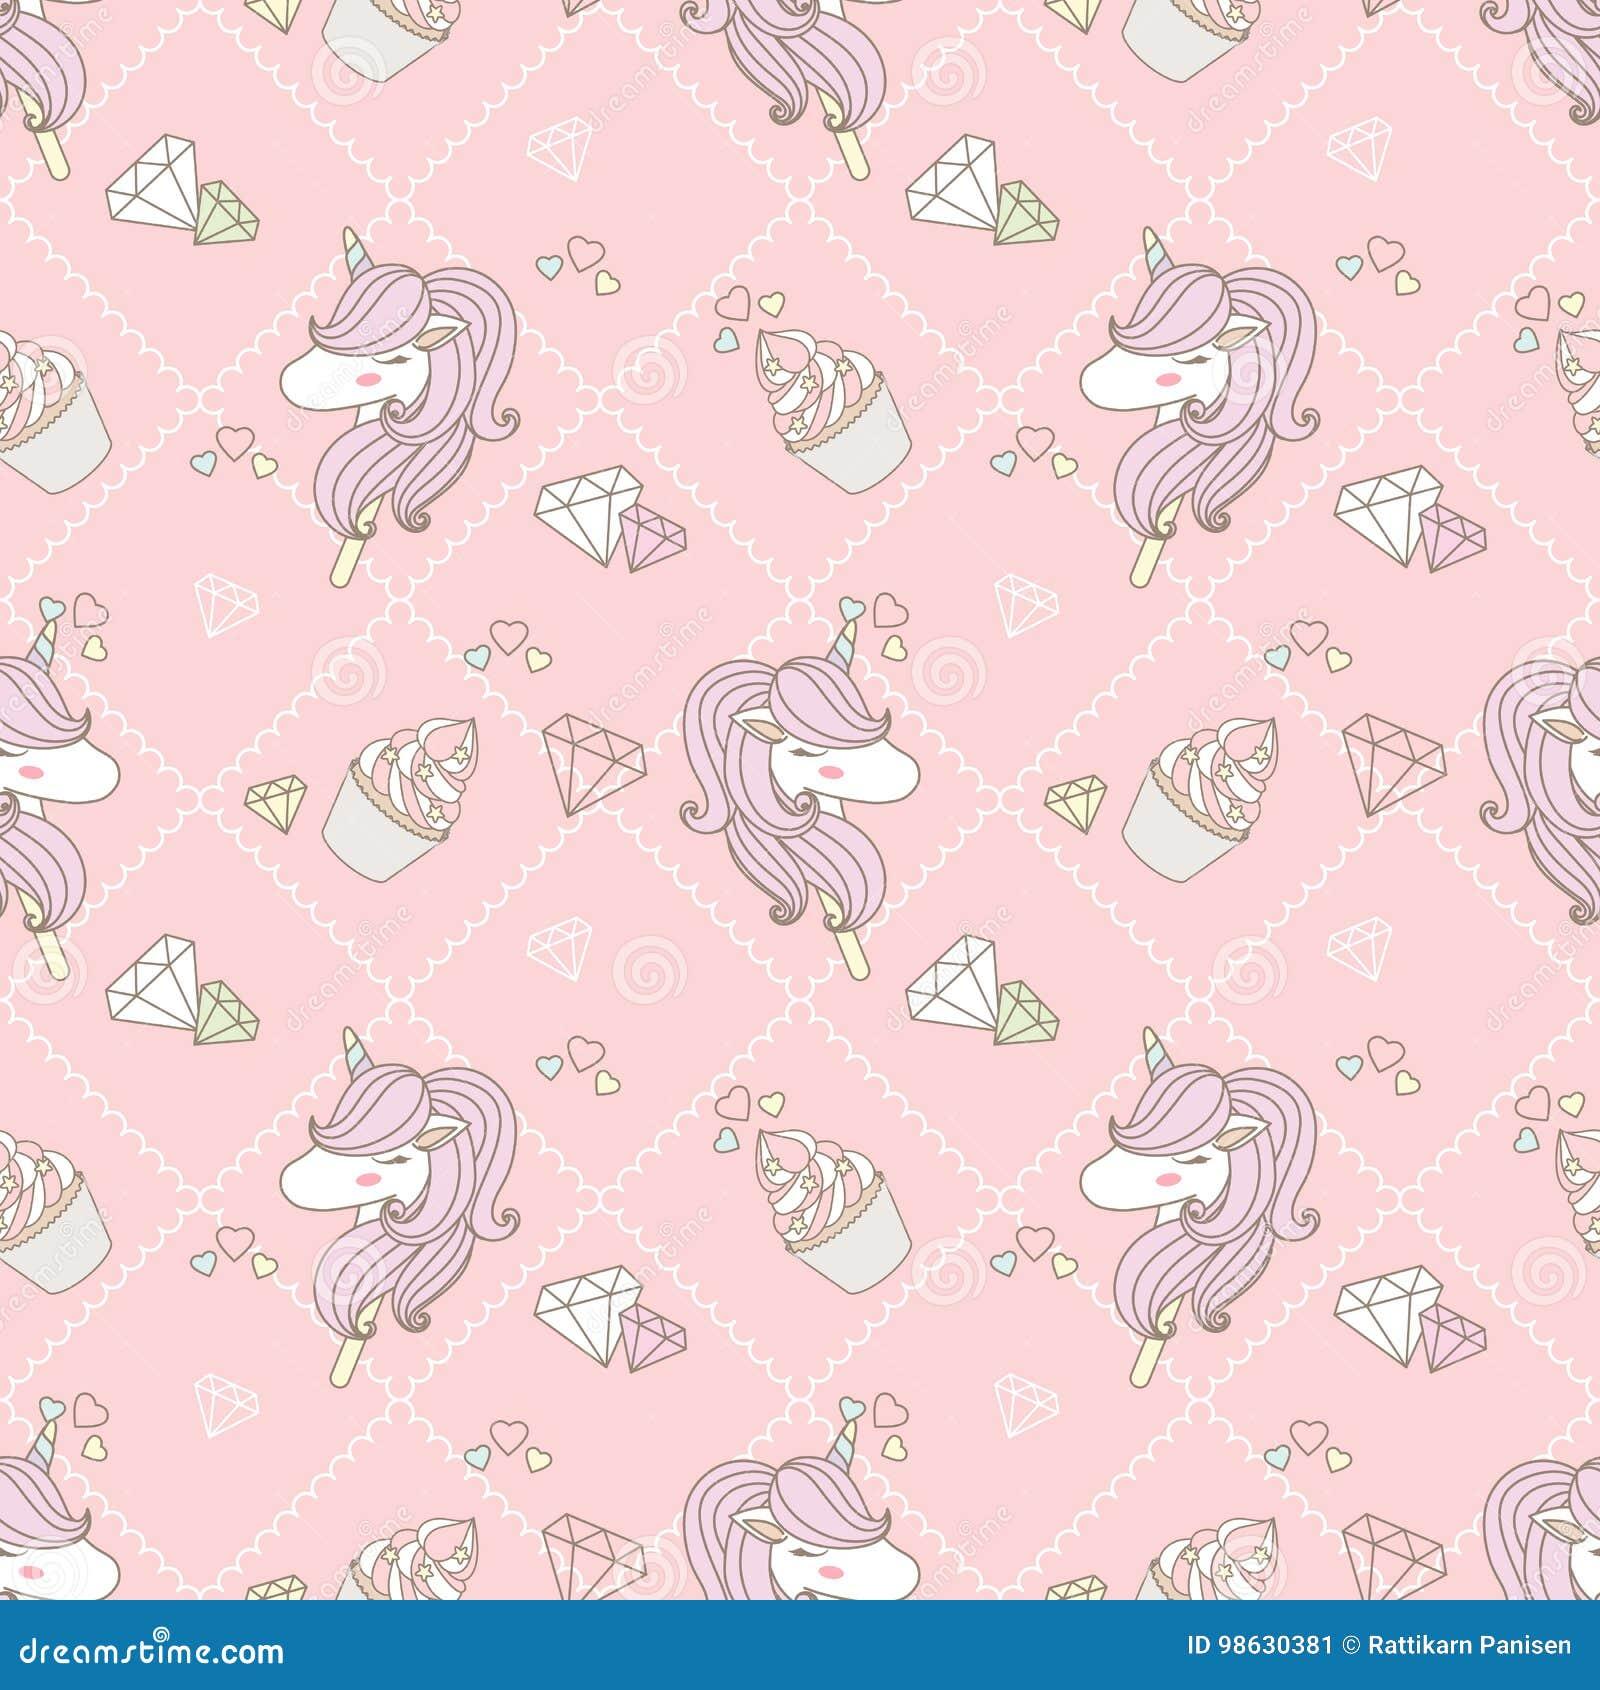 Cute Unicorn And Cupcake Stock Illustration Illustration Of Pastel